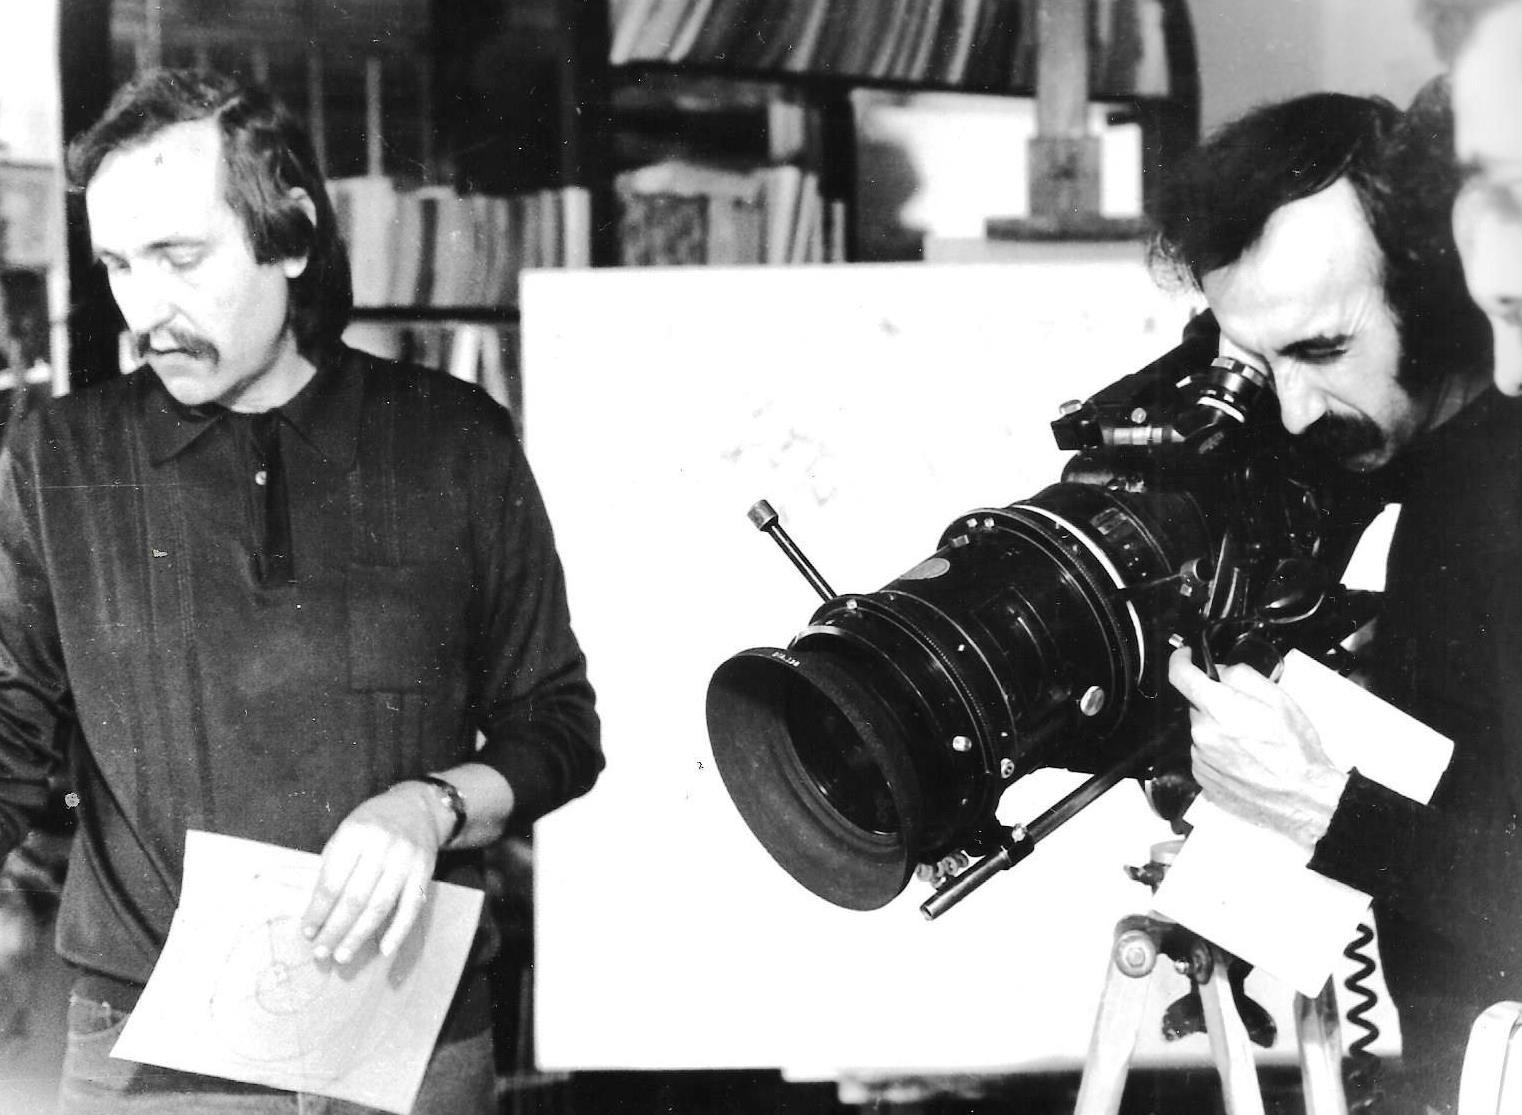 JP-Lledo-et-Denis-Martinez---Tournage-2-films-l'Oeuvre-et-le-Peintre.-1984,-Blida,-